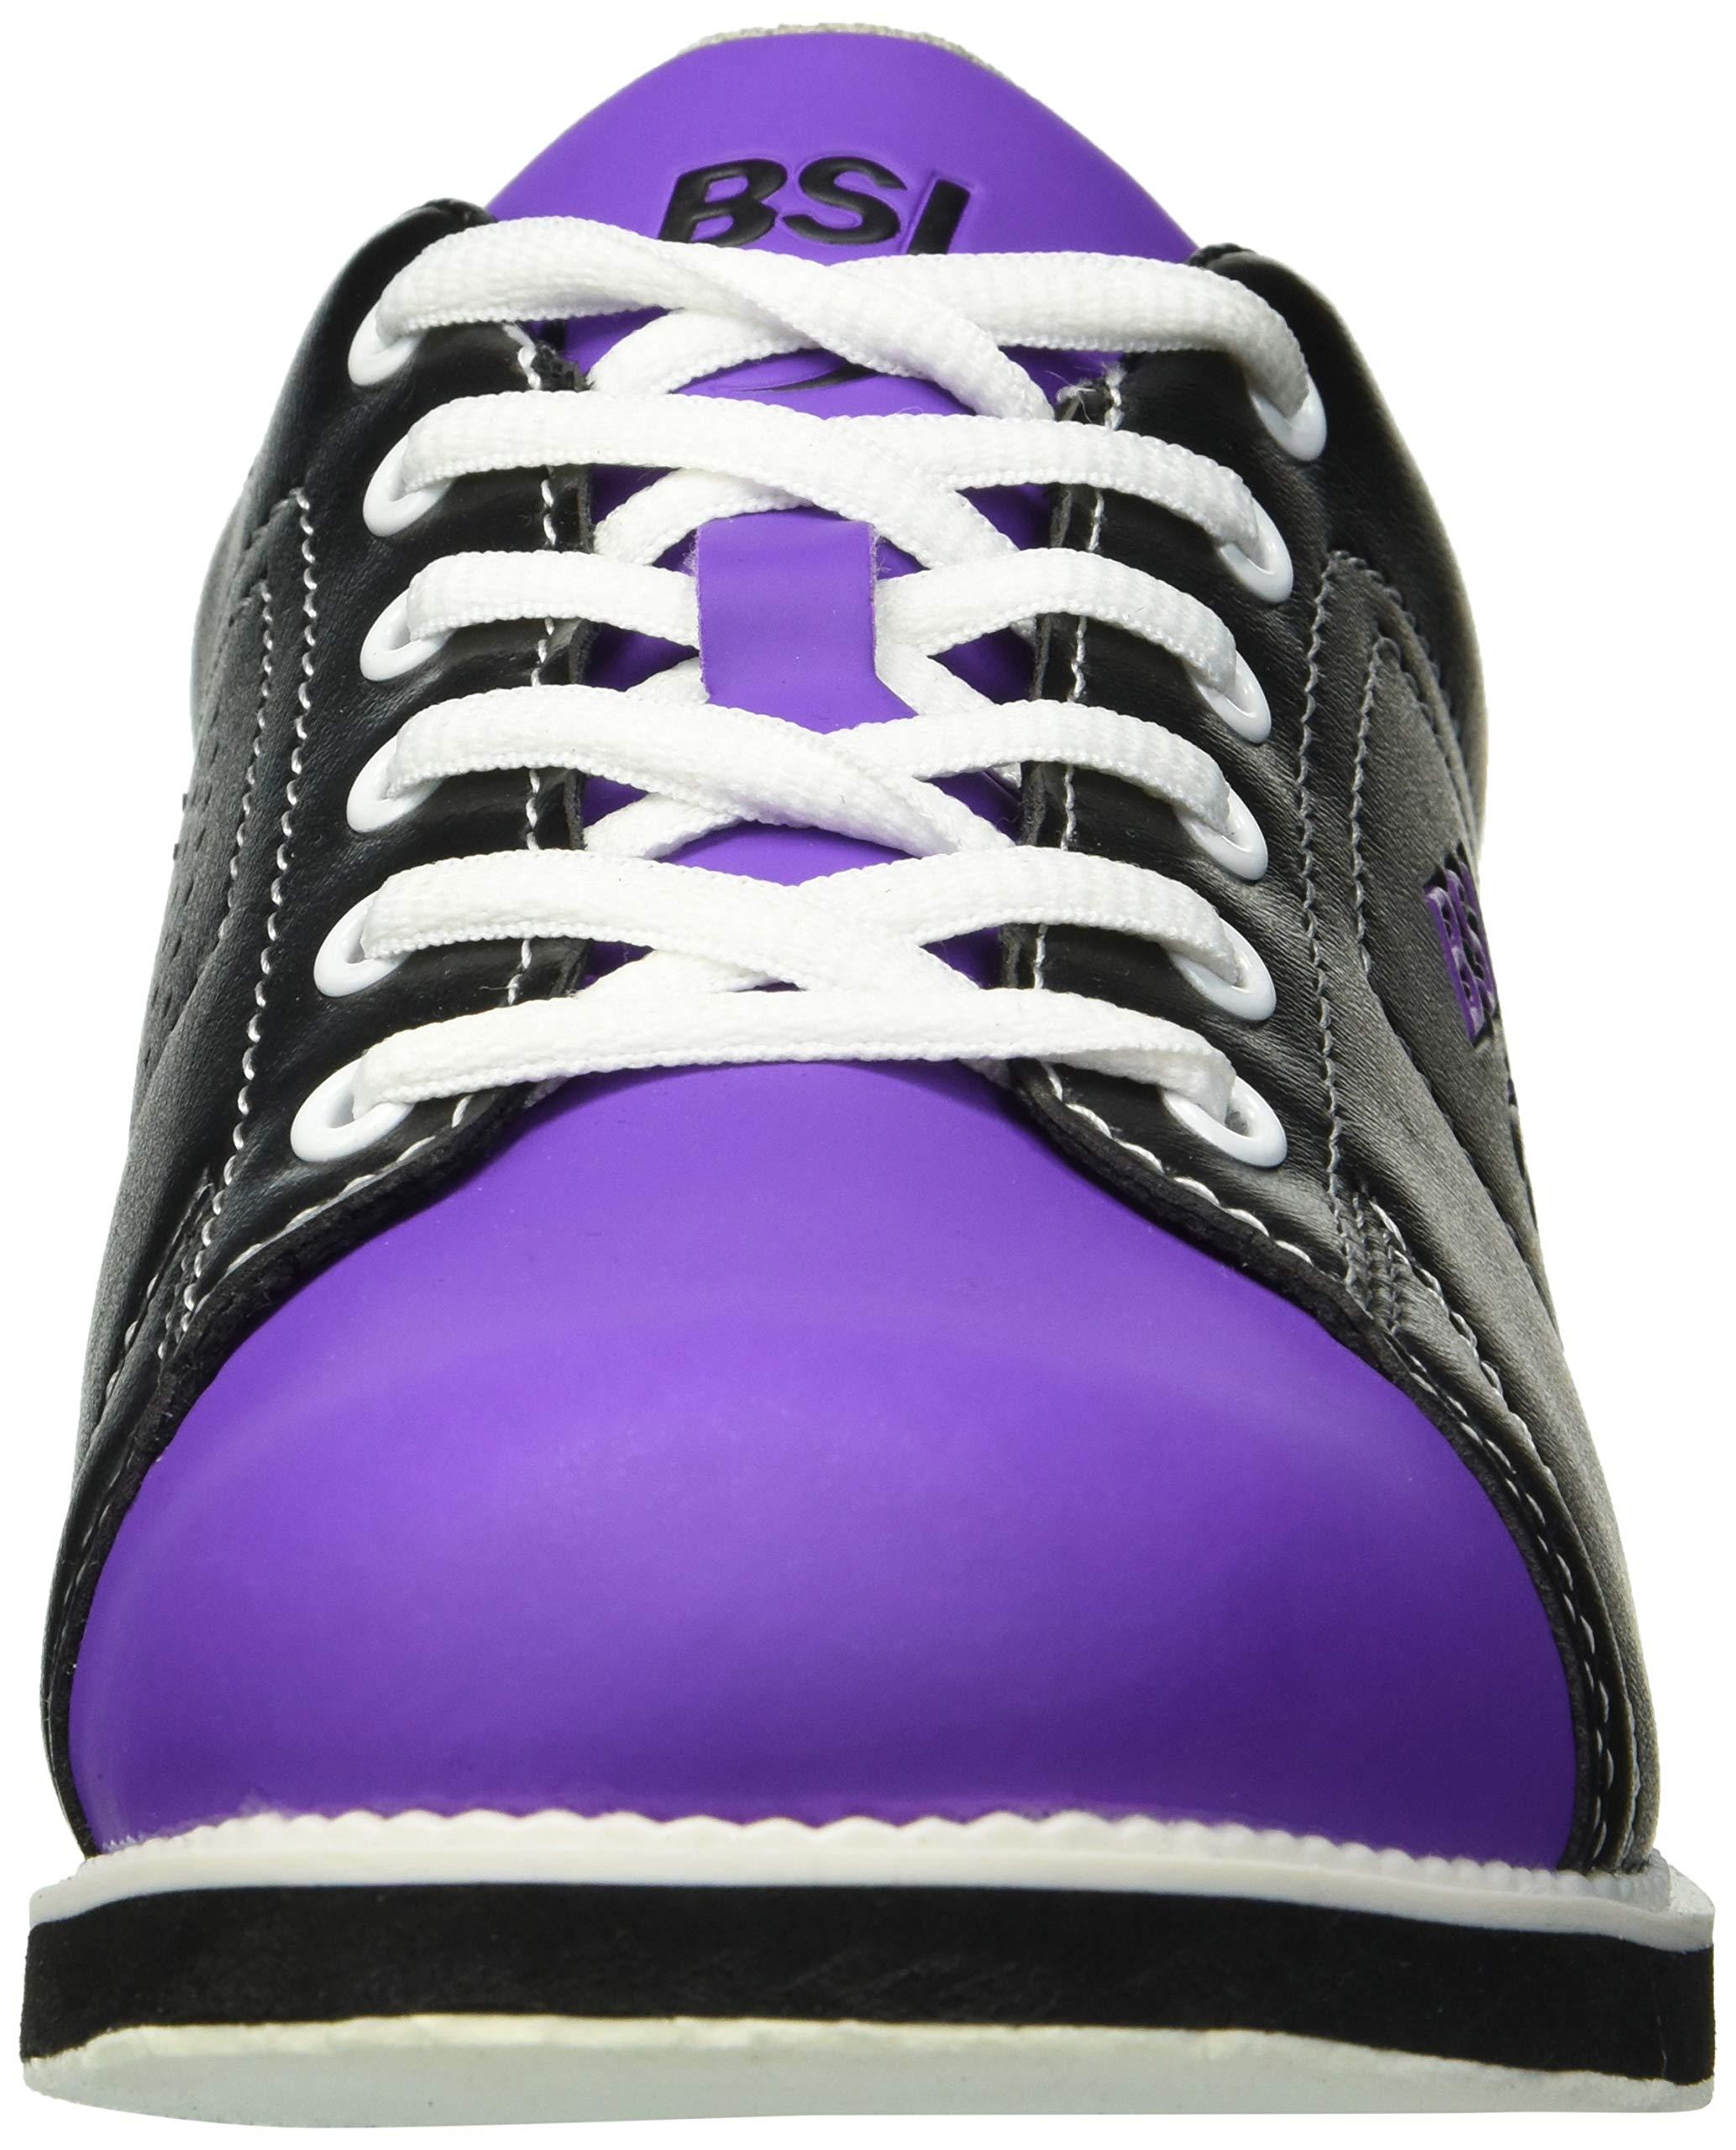 BSI 654 Women's Classic #654, Black/Purple, 7.0 by BSI (Image #4)